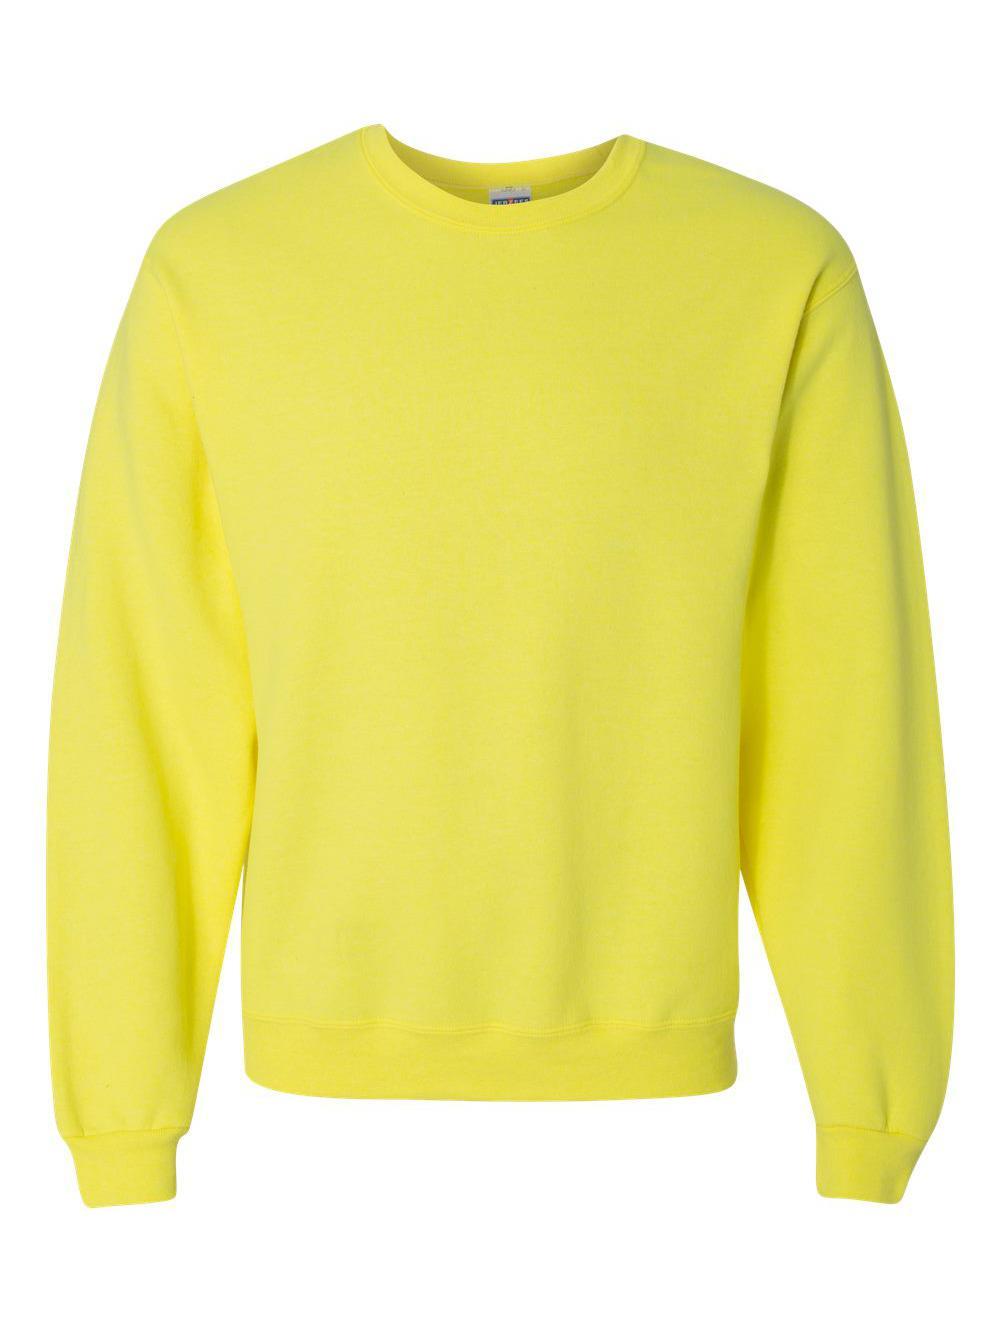 Jerzees-NuBlend-Crewneck-Sweatshirt-562MR thumbnail 66